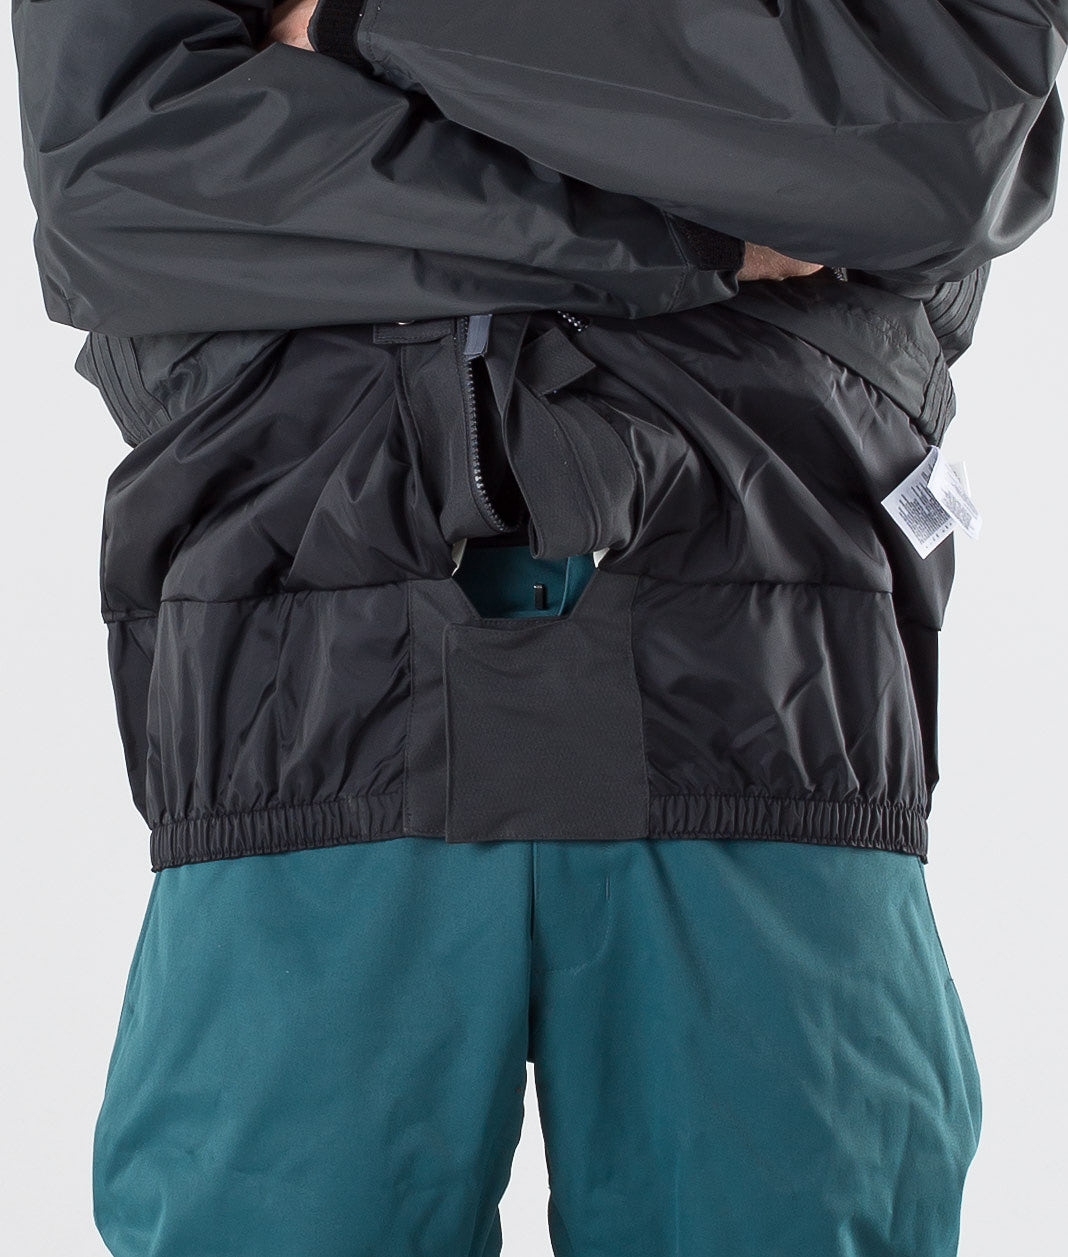 Adidas Snowboarding Premier Riding Jacka Carbon